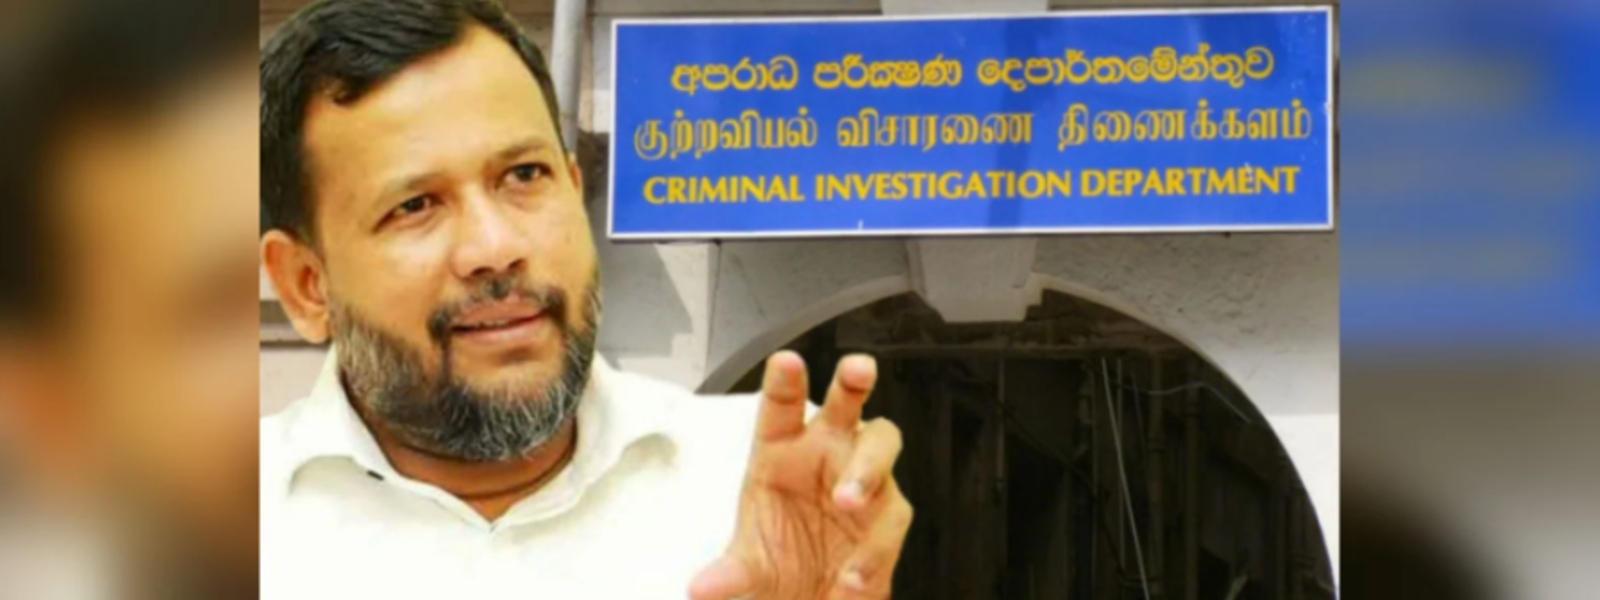 Ex-Minister Rishad Bathiudeen arrives at CID